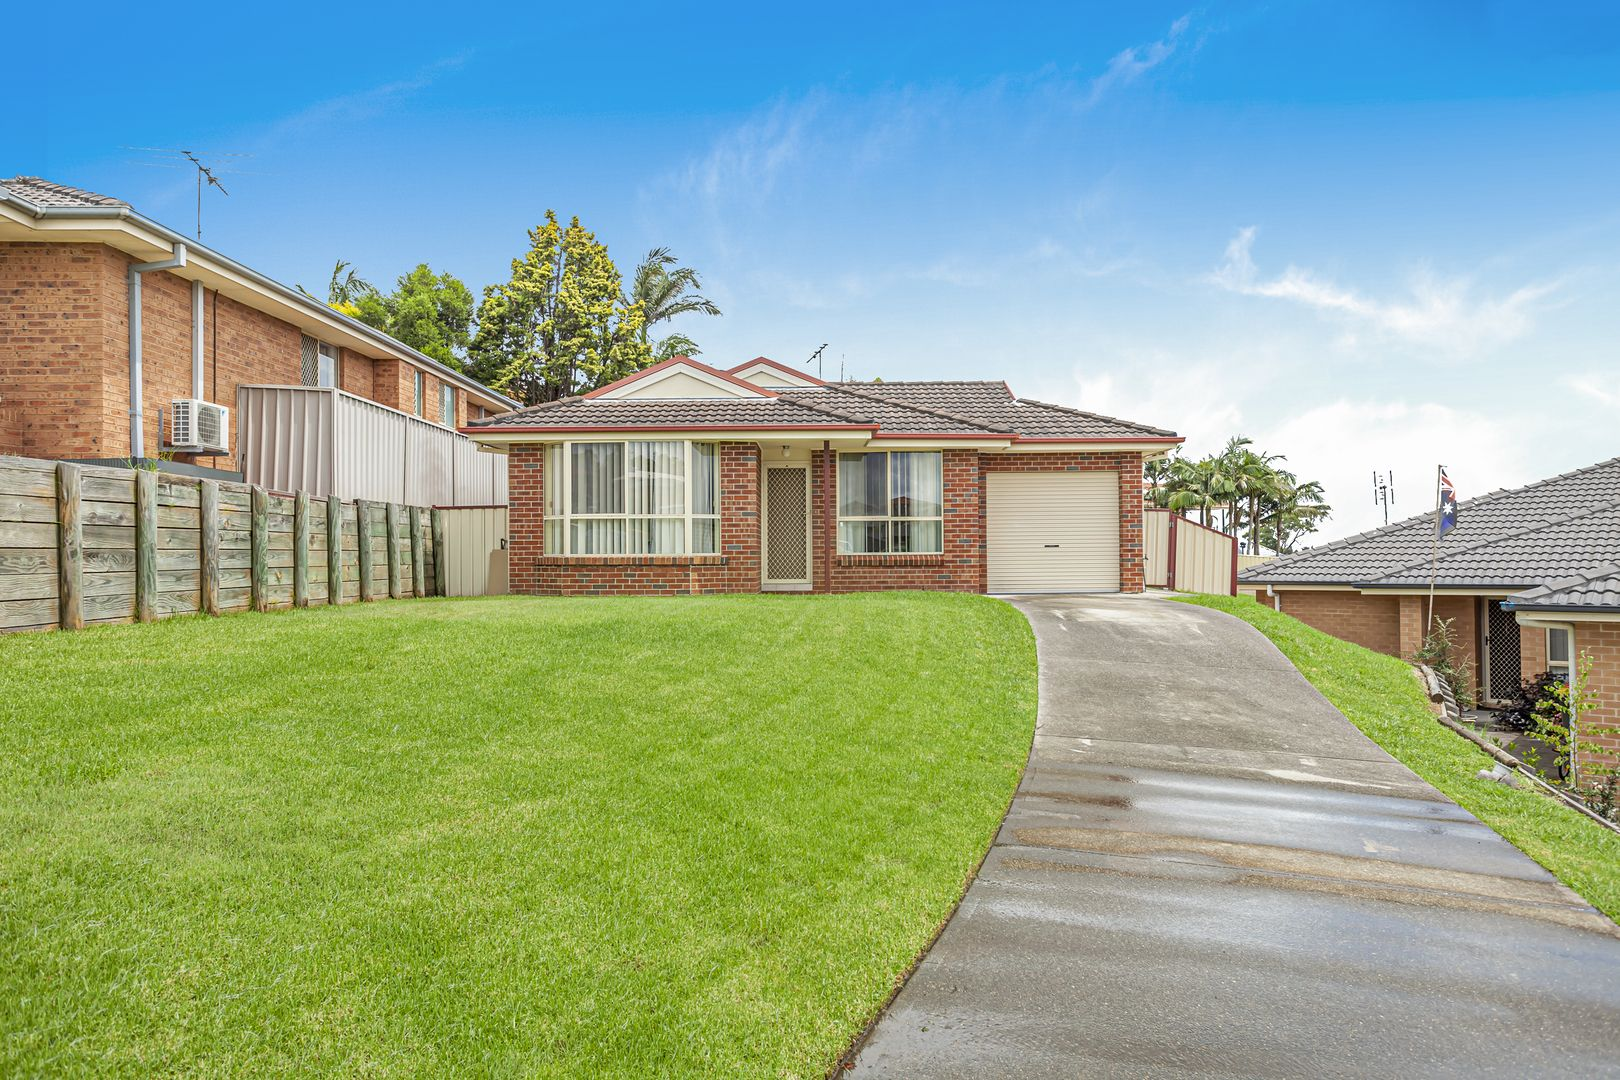 2A Talavera Close, Raymond Terrace NSW 2324, Image 0